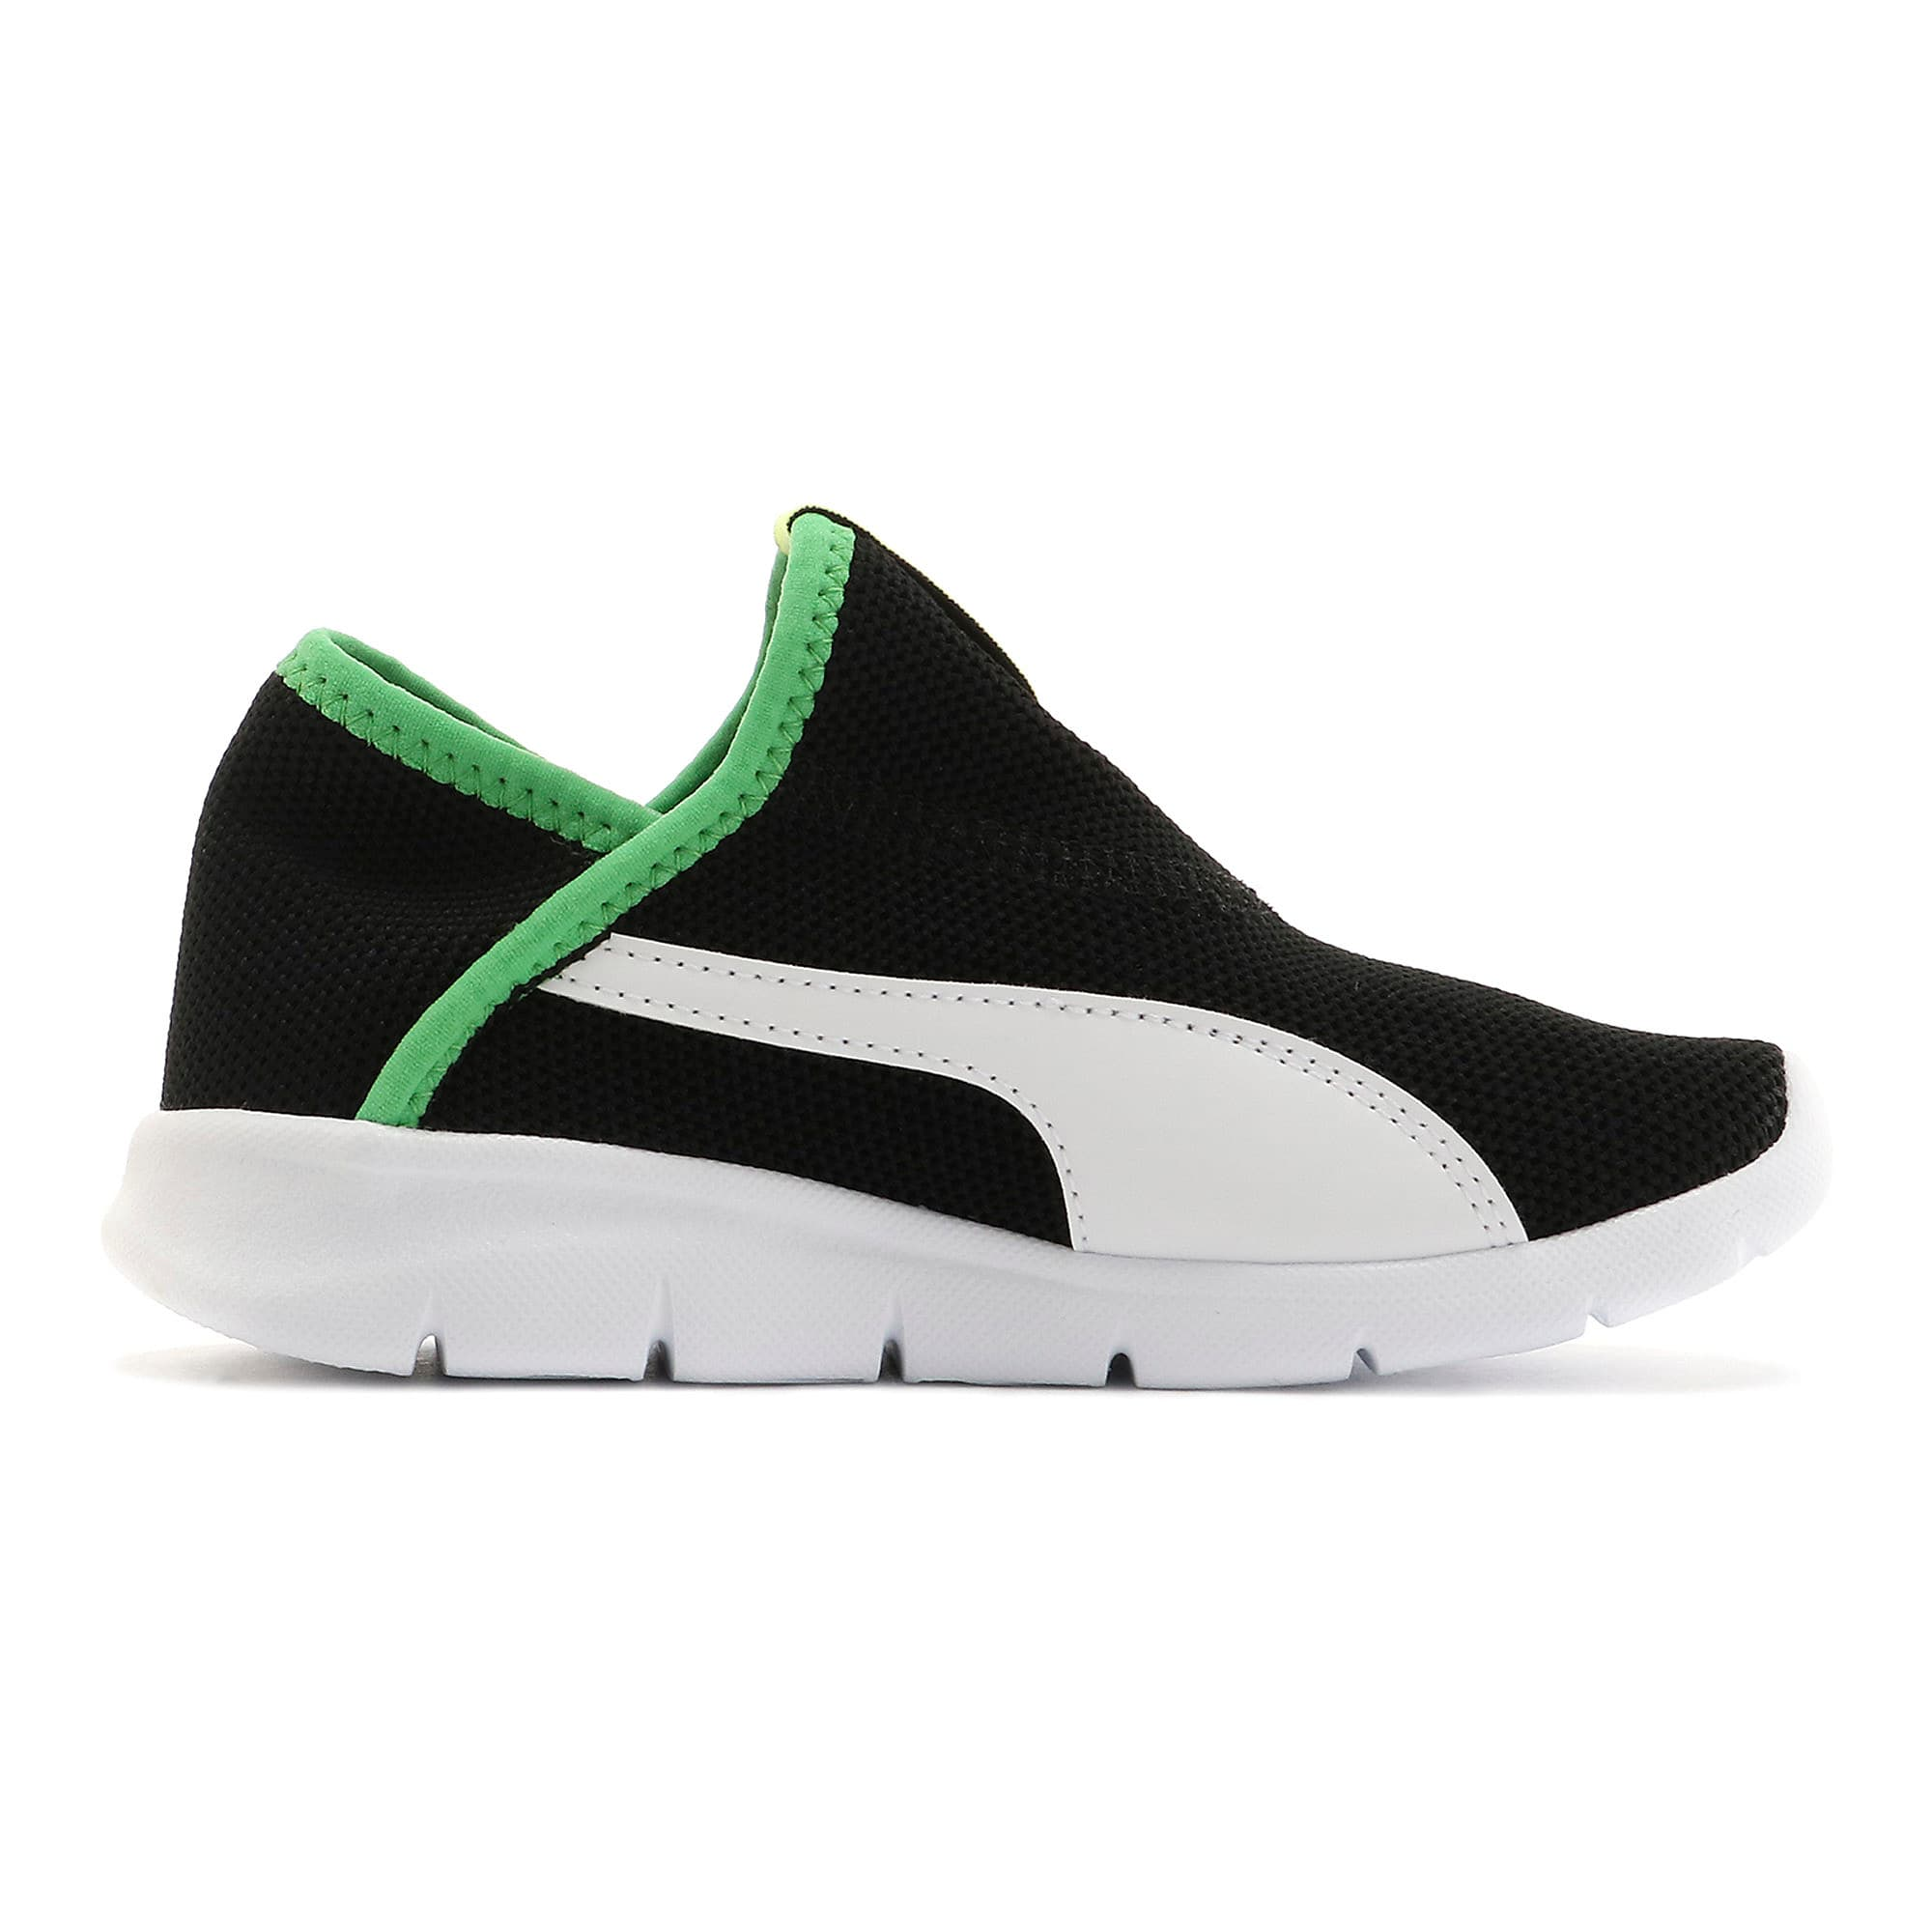 Thumbnail 5 of キッズ プーマ バオ 3 ソック PS 17-21cm, Puma Black-White-Irish Green, medium-JPN